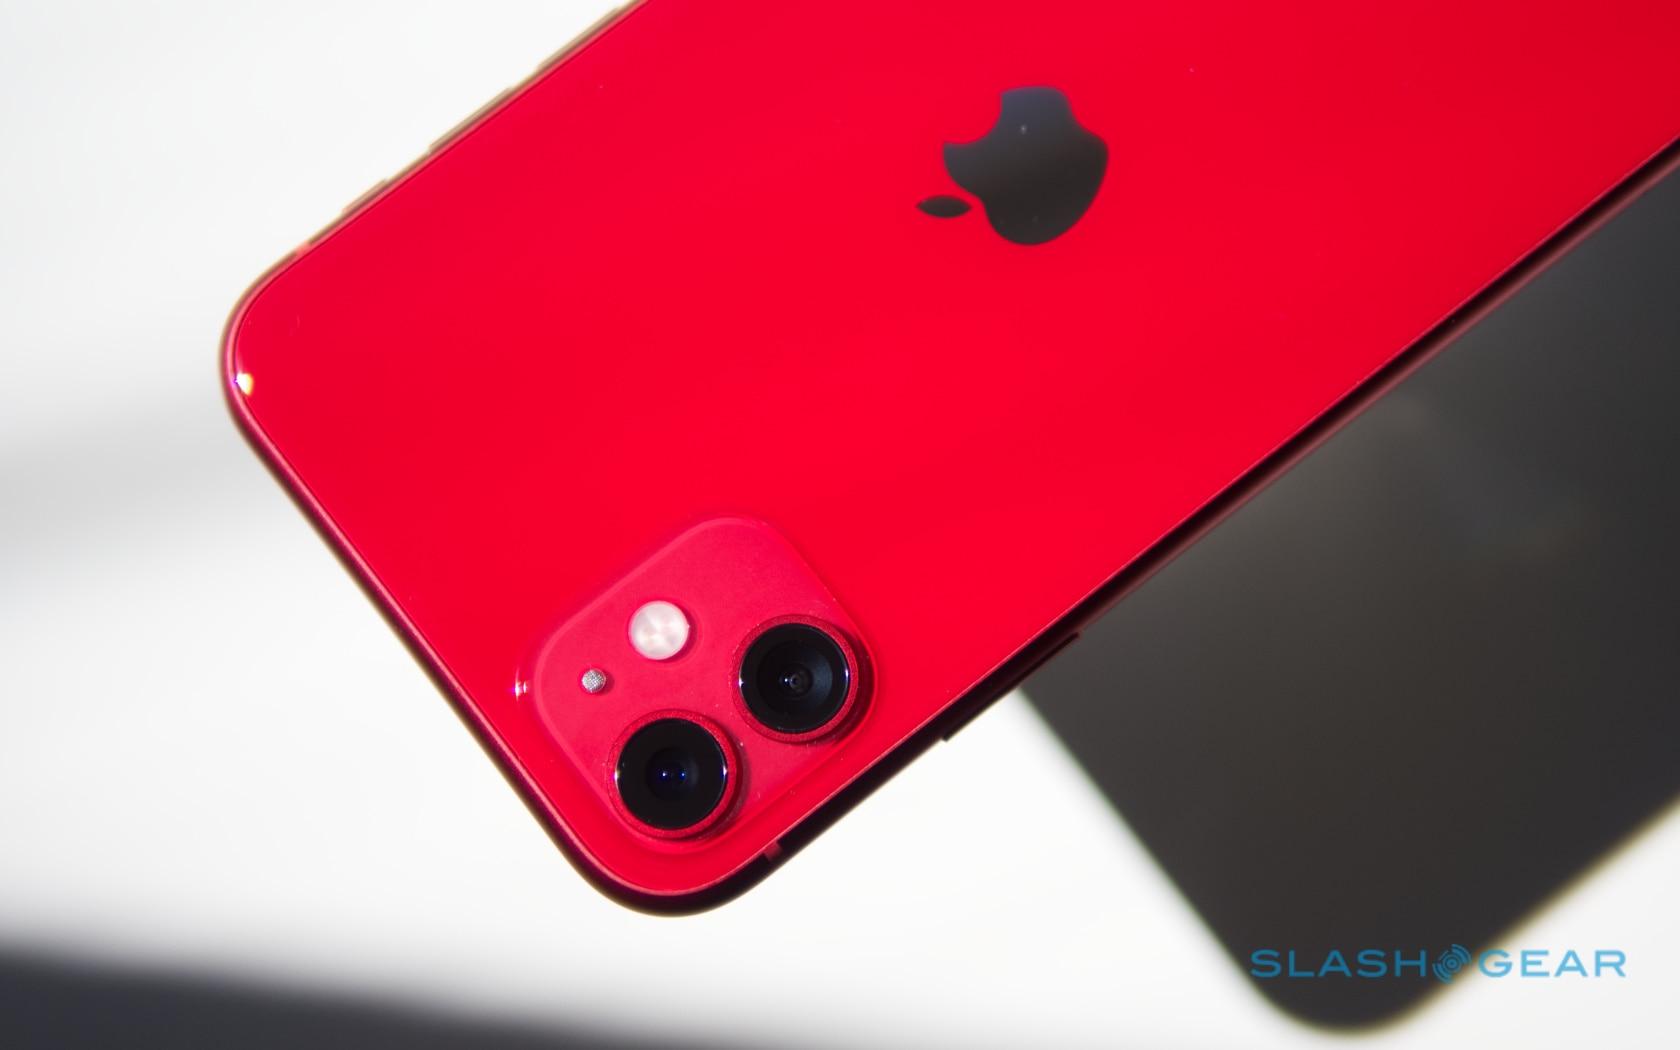 Iphone 12 Mini Leaks Tease 10 Years Of Nostalgic Dreams Slashgear